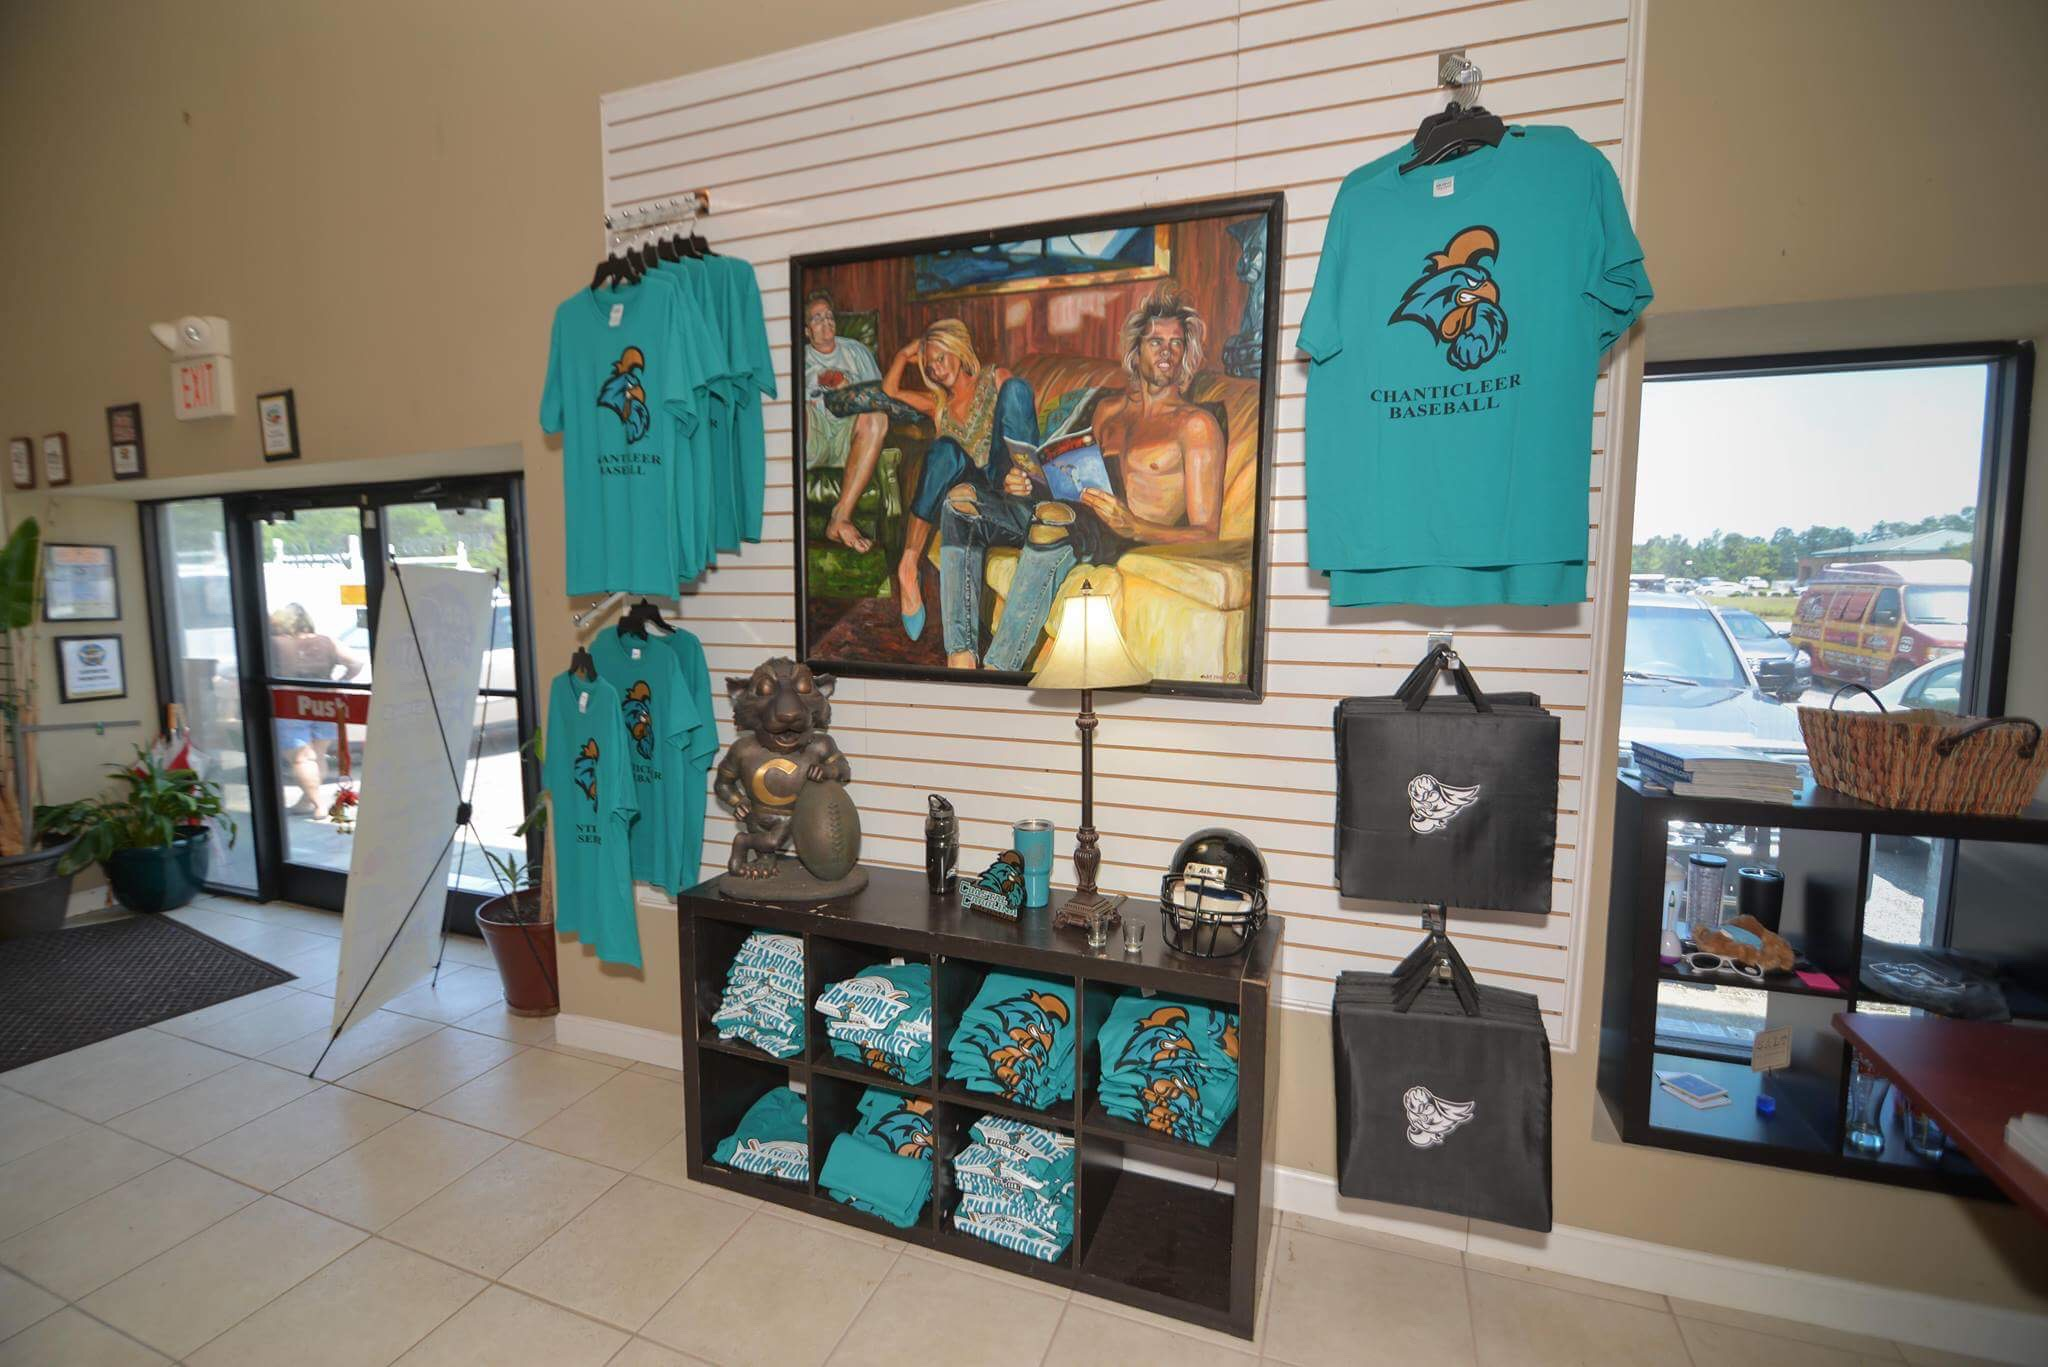 Showroom showing screen printed items